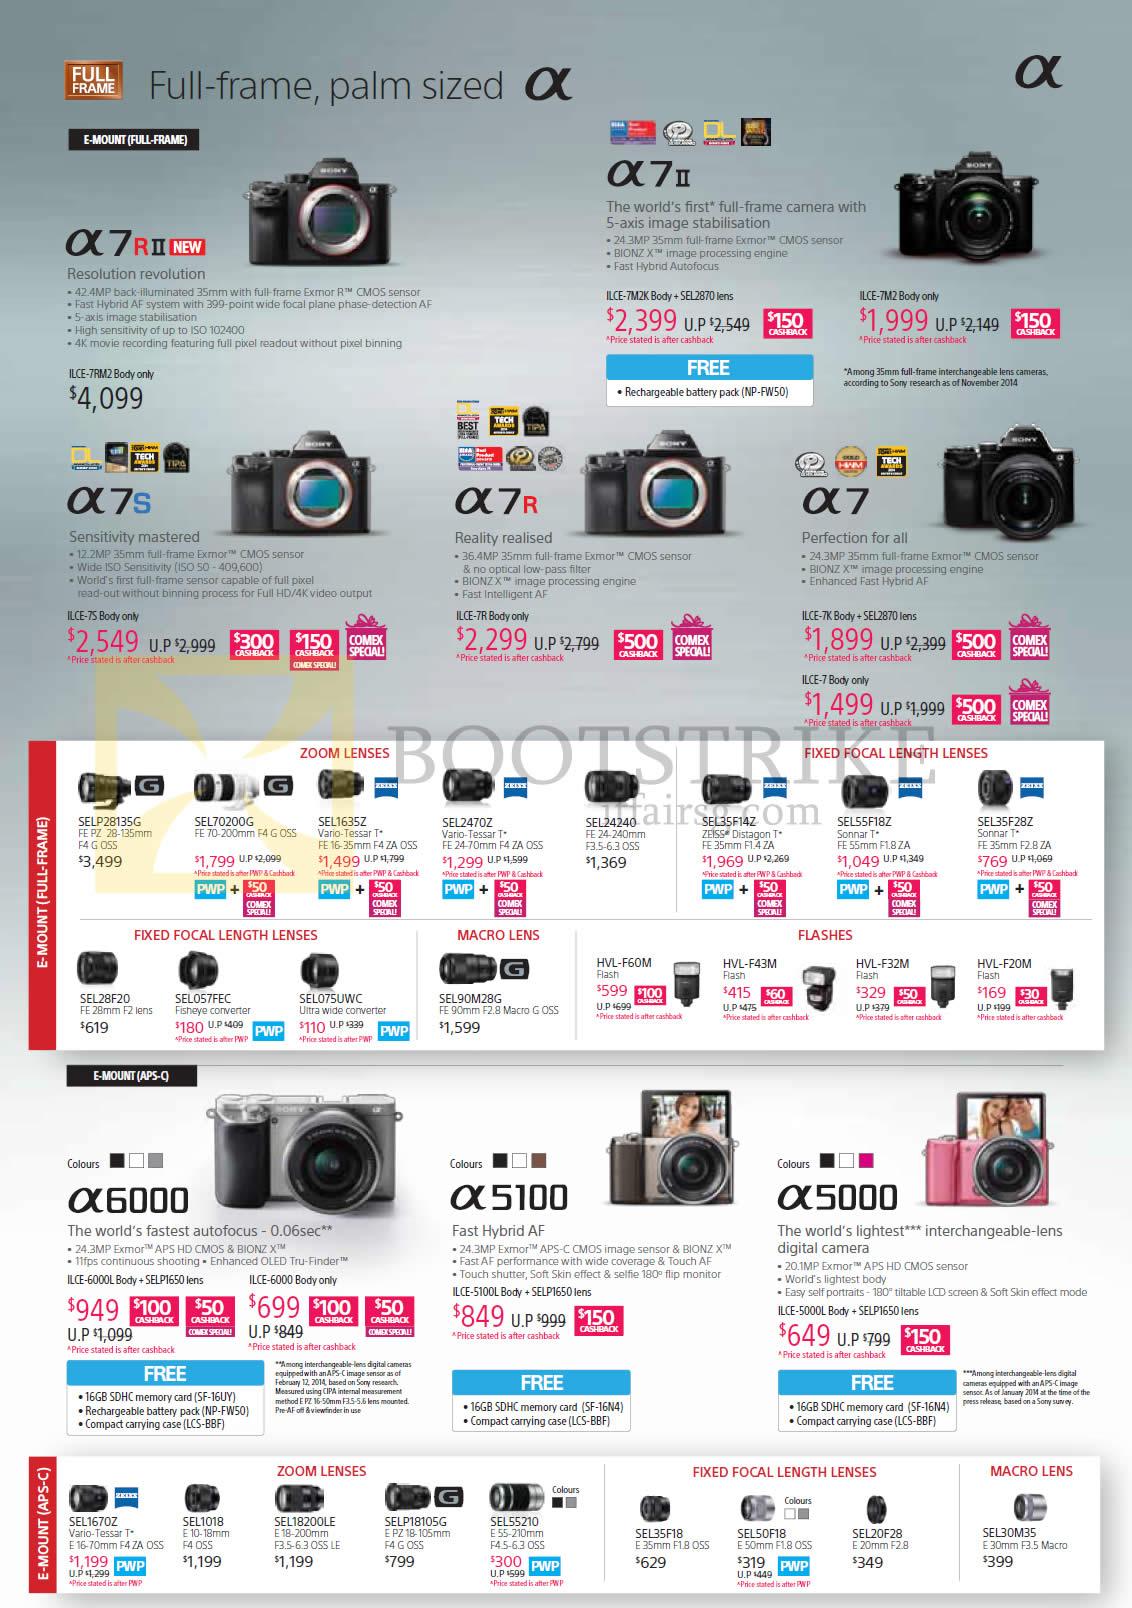 Sony Digital Cameras Alpha ILCE A7R, A7II, A7S, A7R, A7, A6000, A5100, A5000, Lenses Zoom Fixed Focal Macro Flashes